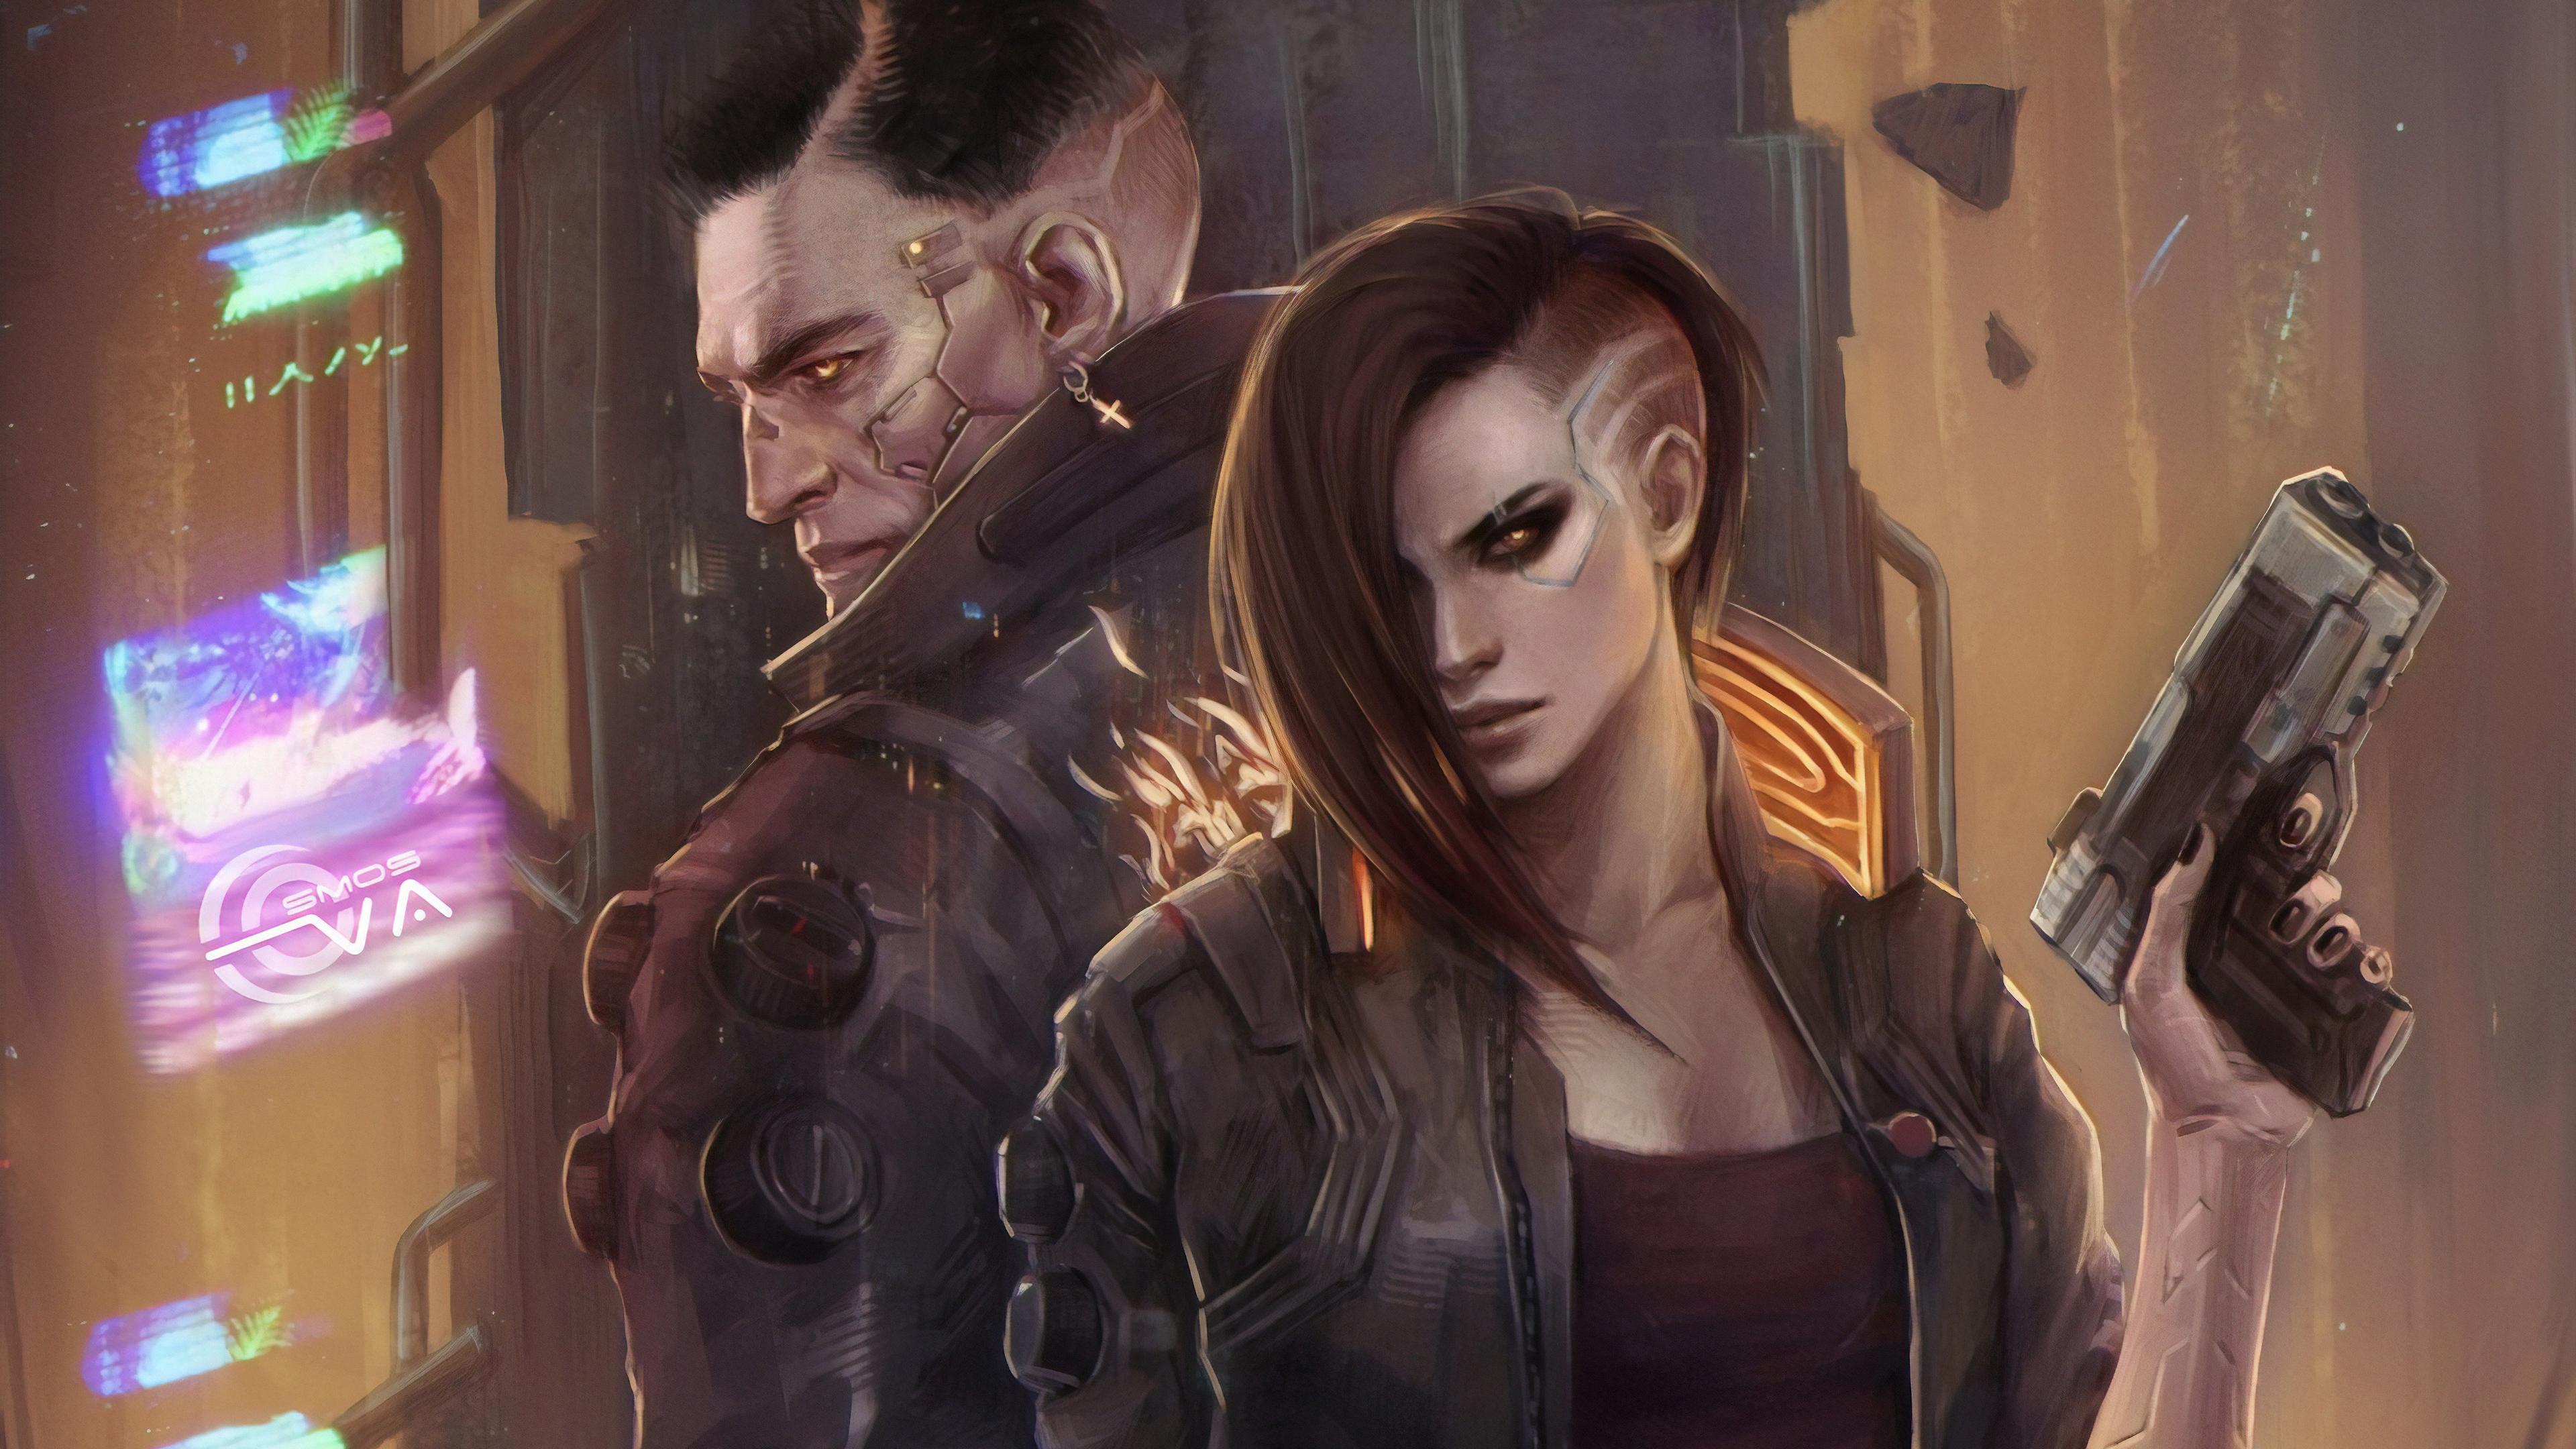 cyberpunk 2077 game 2019 1570393039 - Cyberpunk 2077 Game 2019 - xbox games wallpapers, ps games wallpapers, pc games wallpapers, hd-wallpapers, games wallpapers, cyberpunk 2077 wallpapers, artstation wallpapers